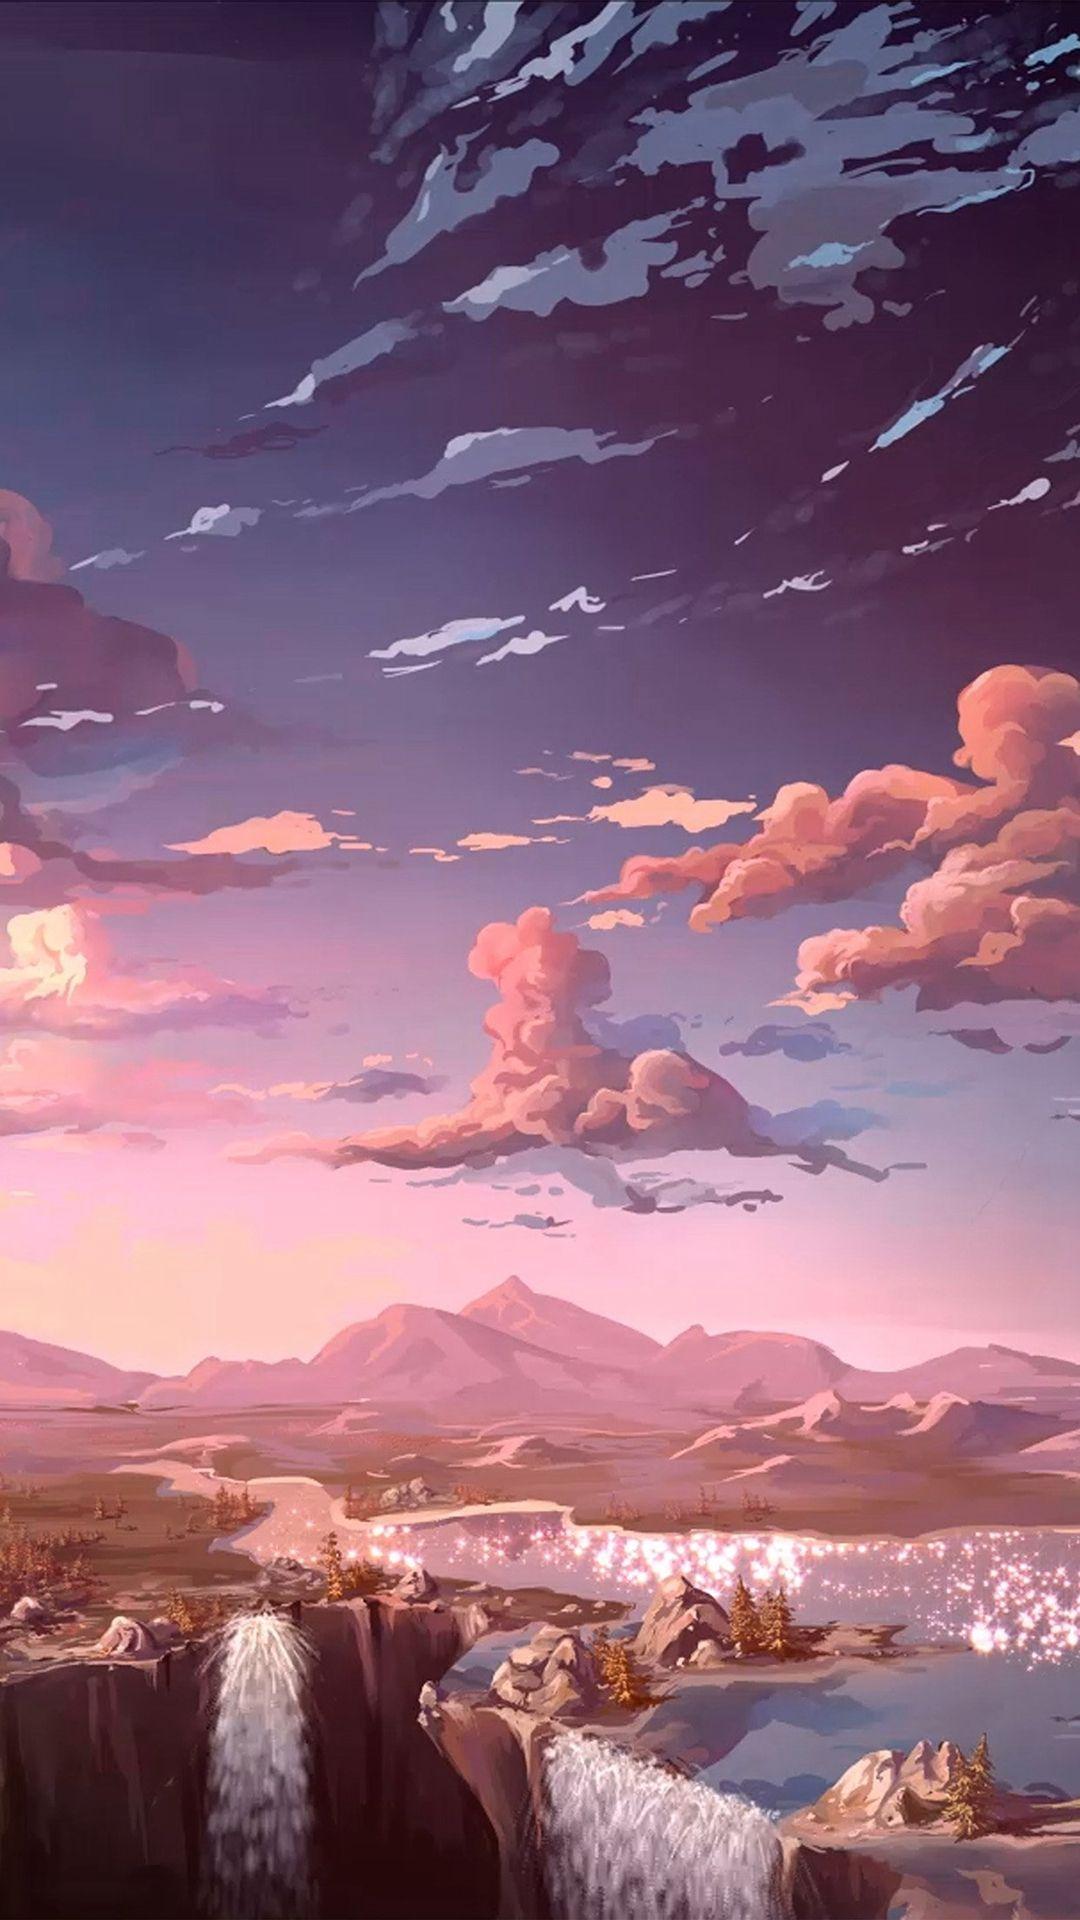 Aesthetic Anime iPhone Wallpapers   Top Aesthetic Anime 1080x1920